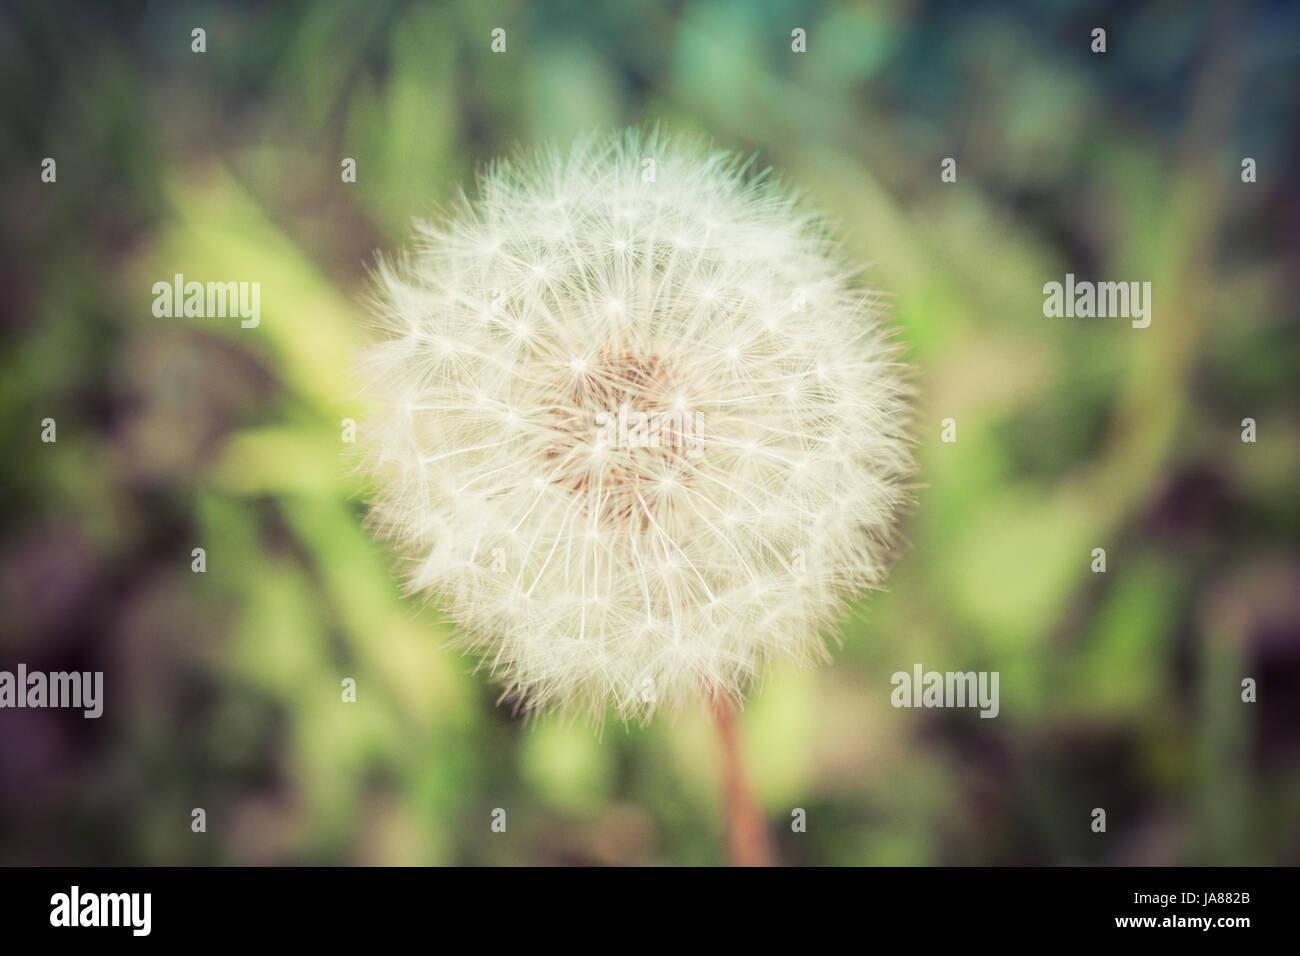 Summer Dandelion Capitulum - Stock Image